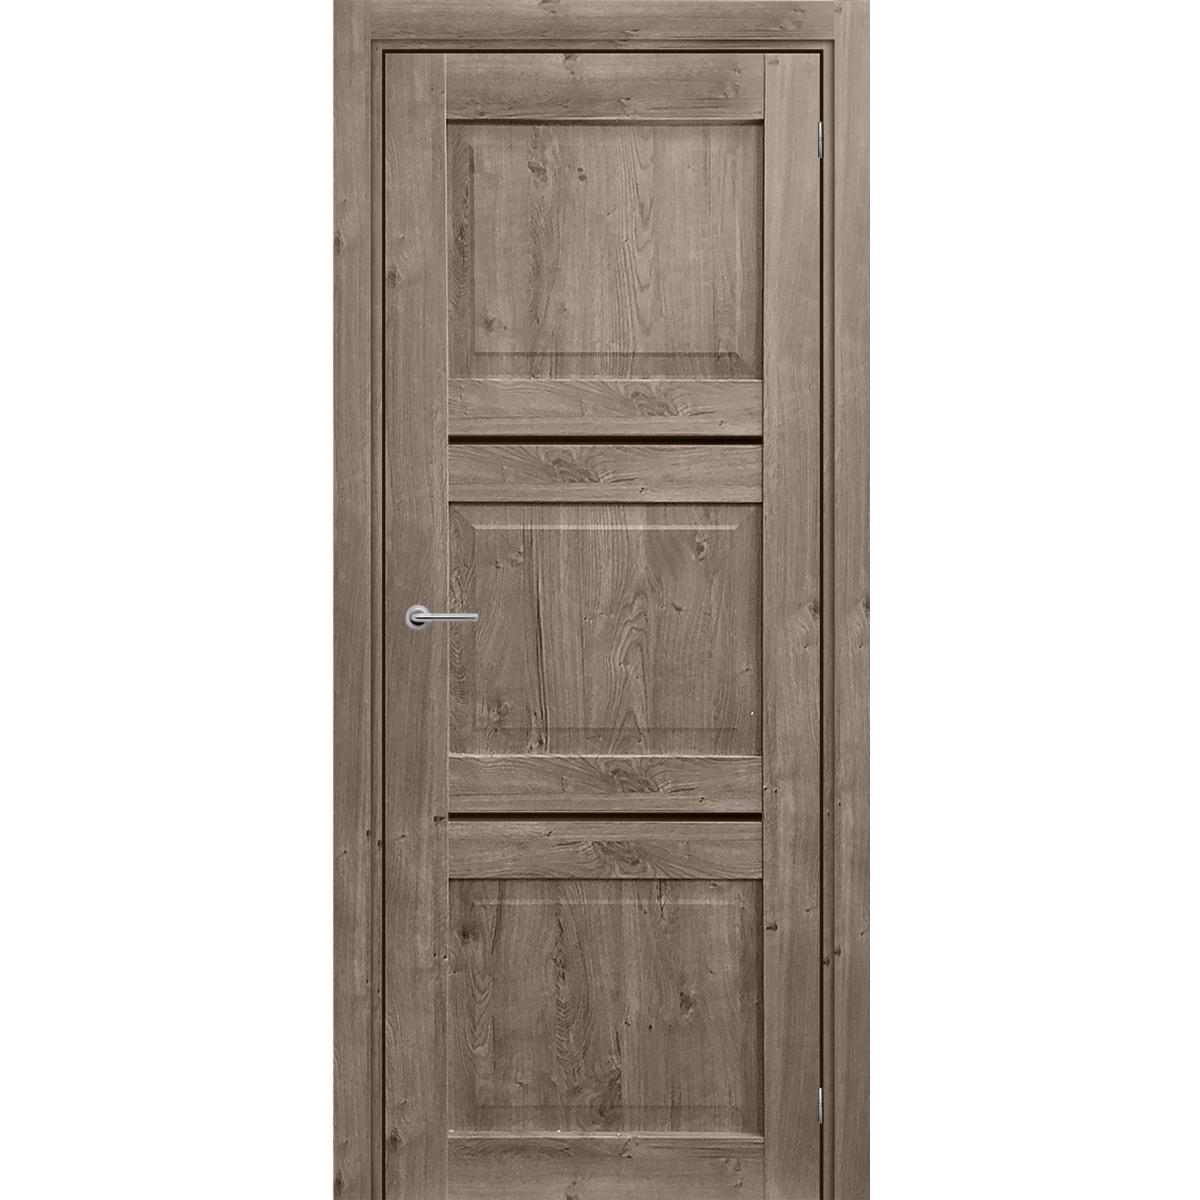 Дверь Межкомнатная Гранде 70Х200 Cpl Цвет Берлин С Фурнитурой